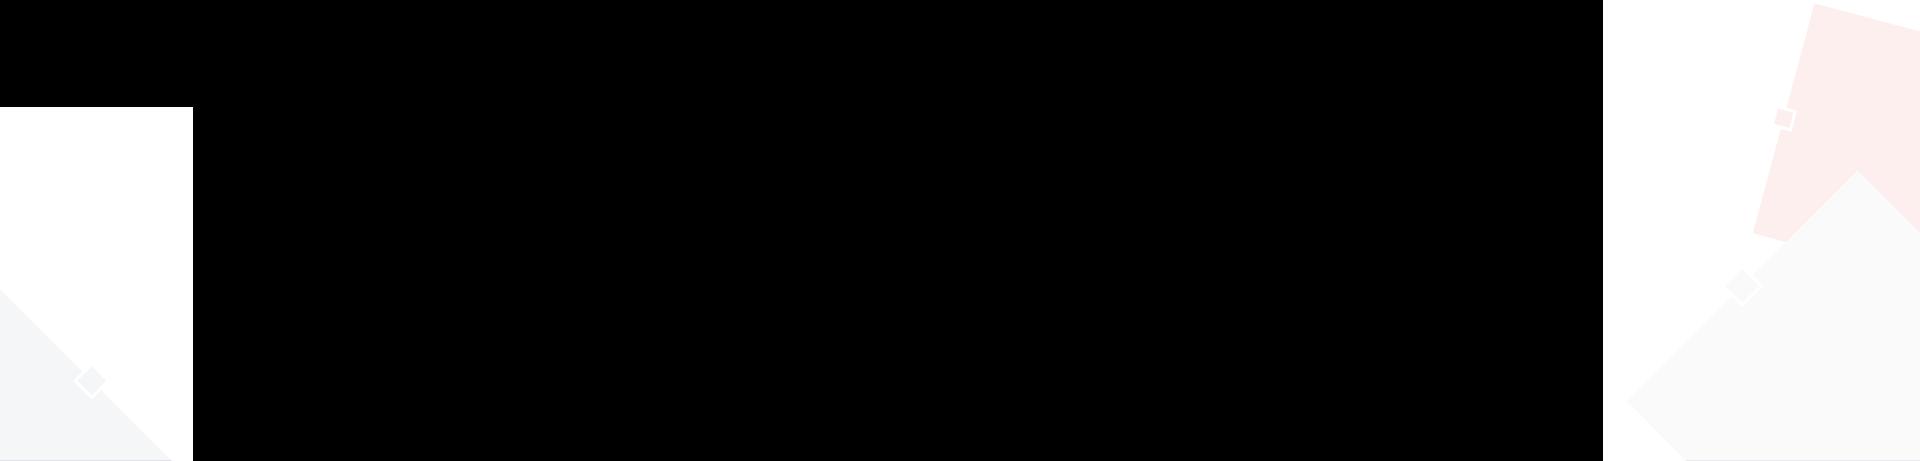 box-illustration